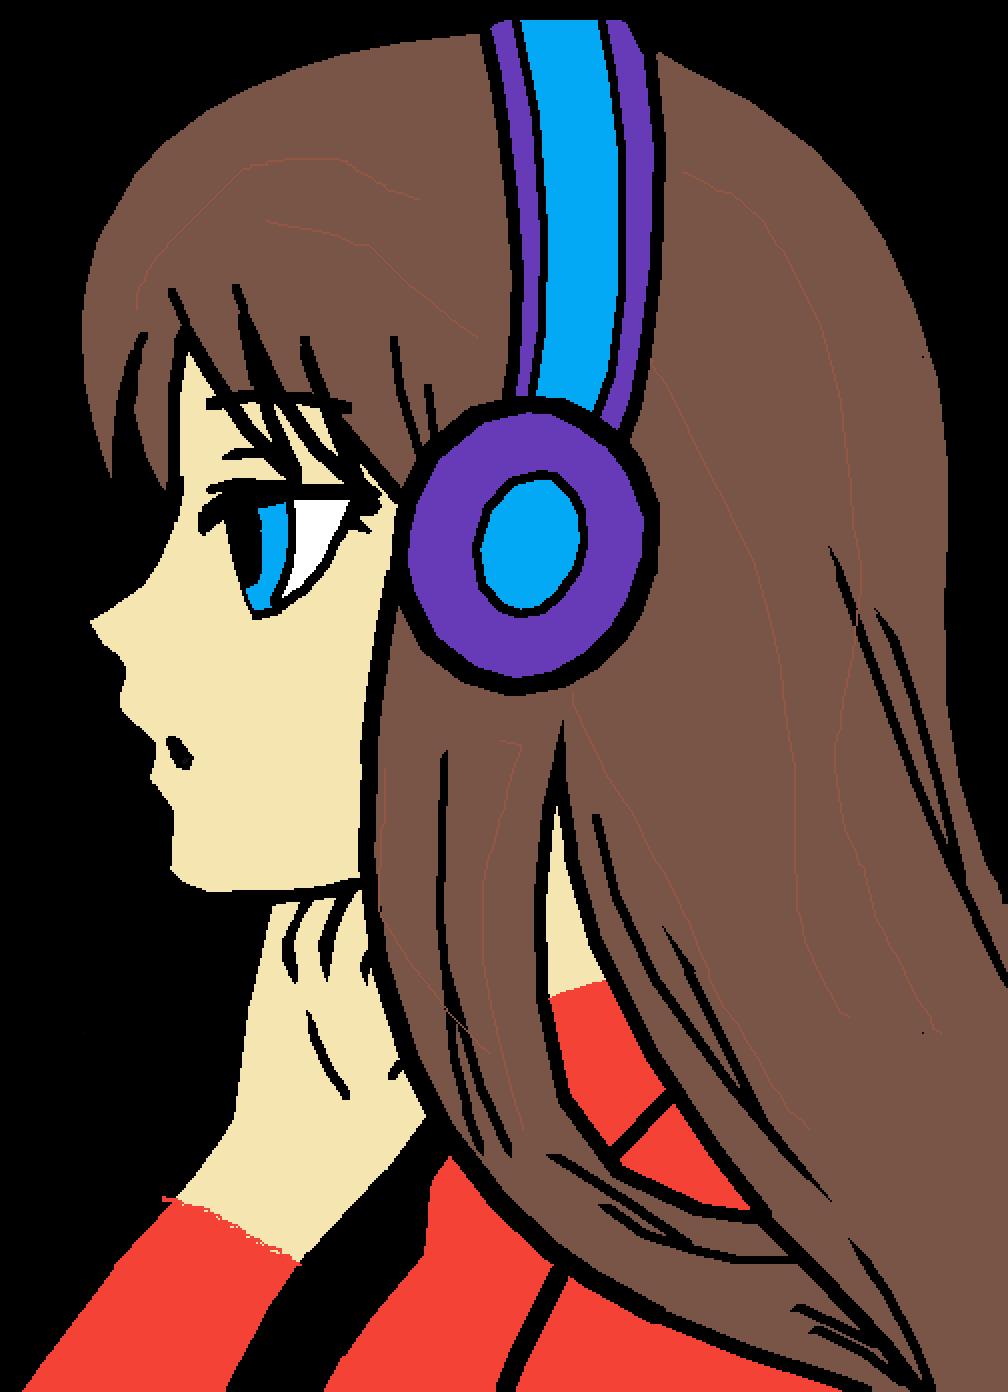 The Music Girl by itsyugurllovlie